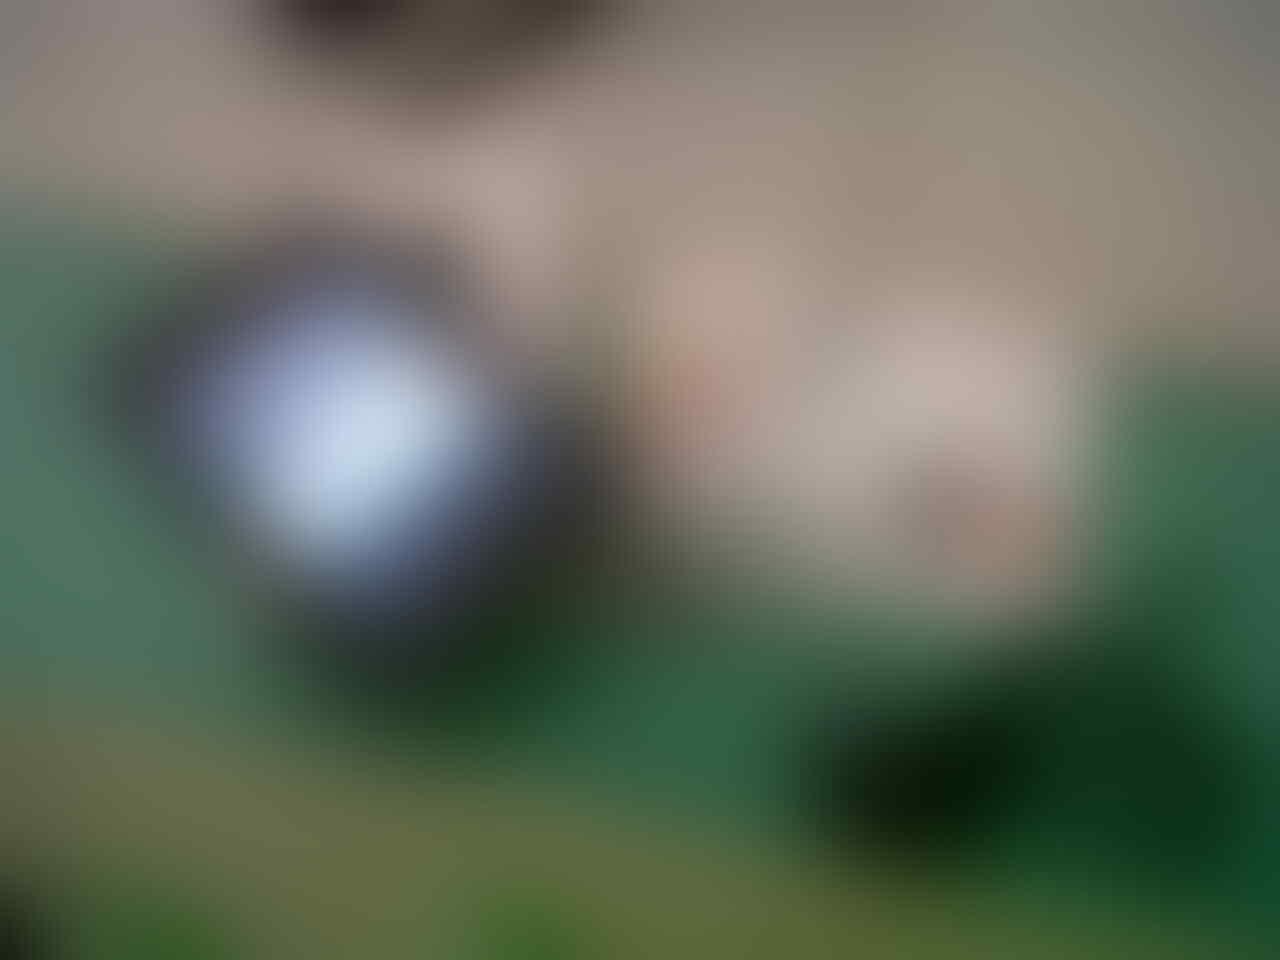 Jual Cepet Smartfren Androtab Versi 2 , Mulus Gak Mahal (COD Bandung Jumat-Minggu)